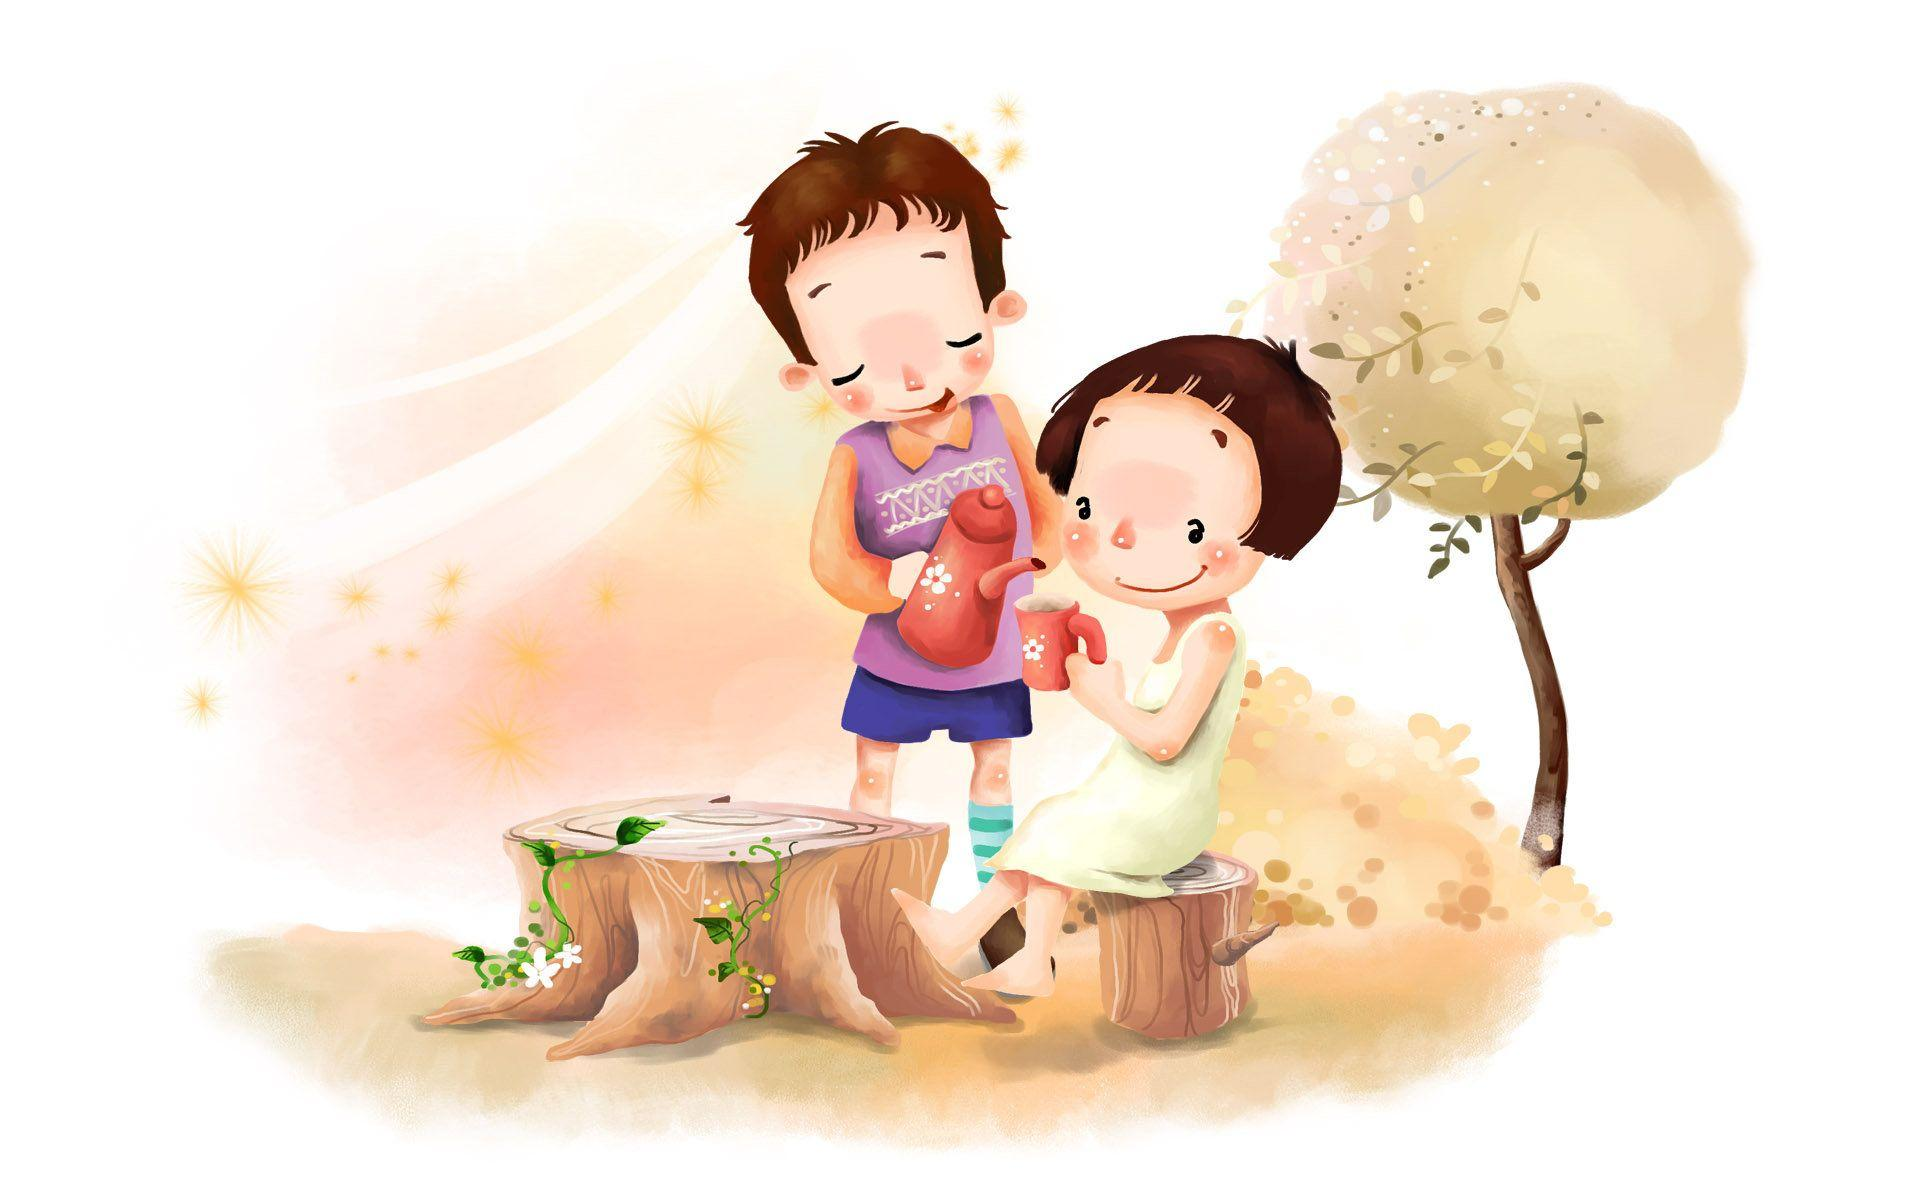 Cute Cartoon Love Couple Wallpapers - Wallpaper Cave